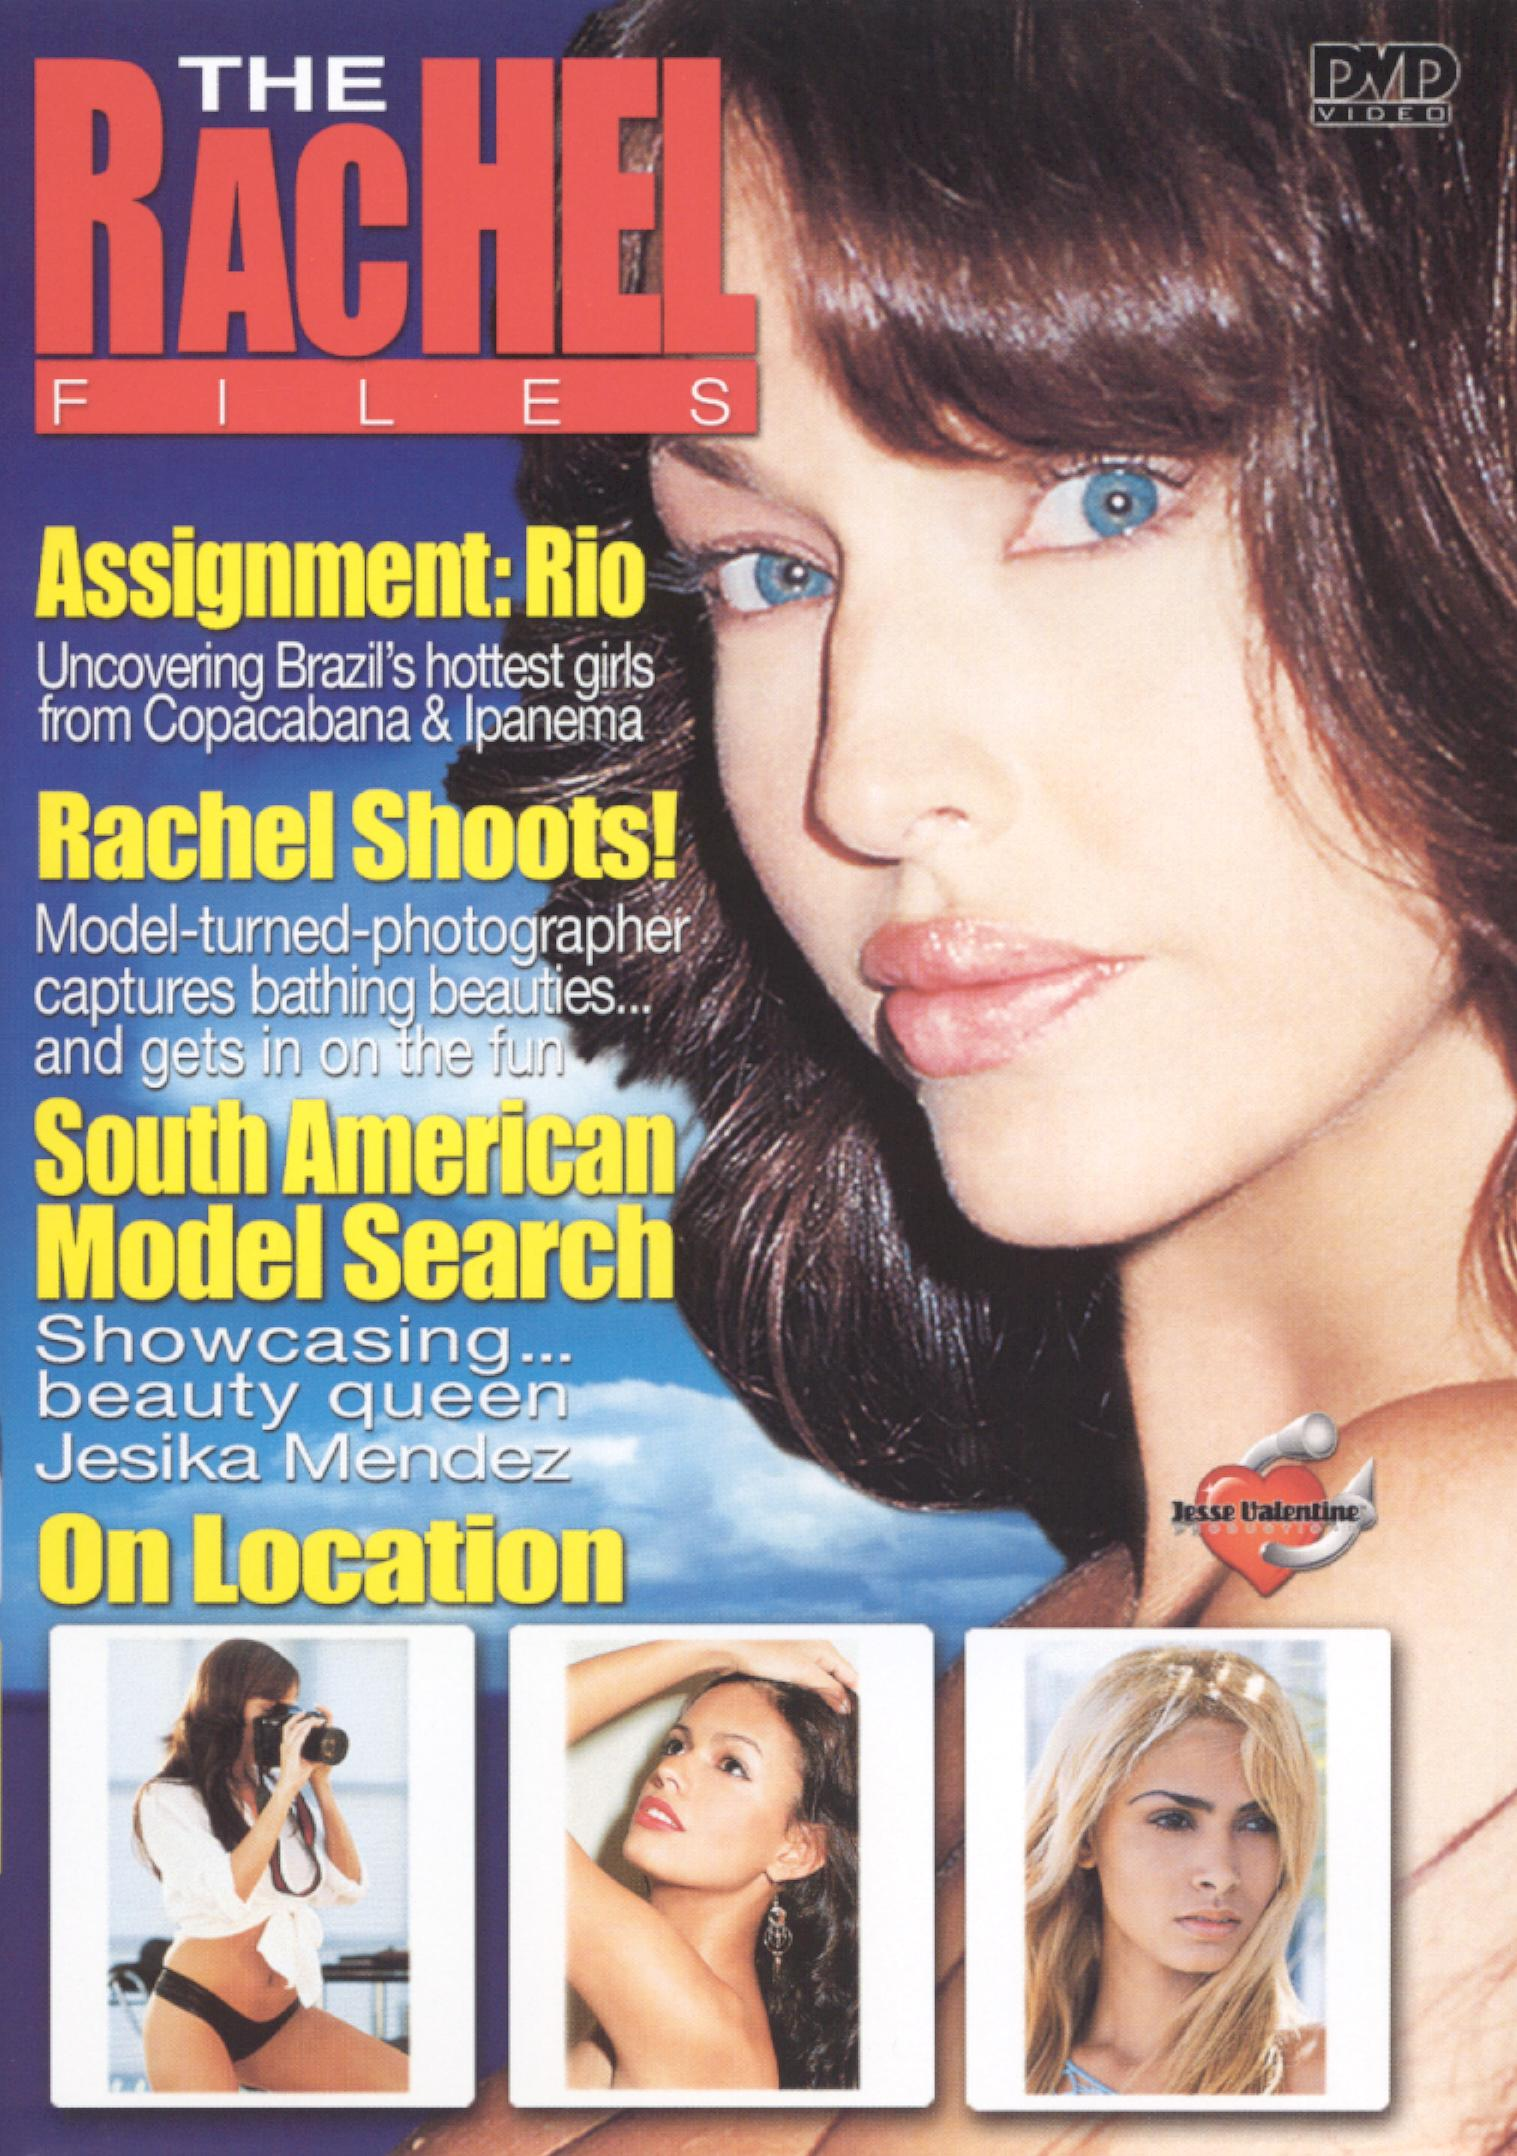 The Rachel Files: Assignment Rio